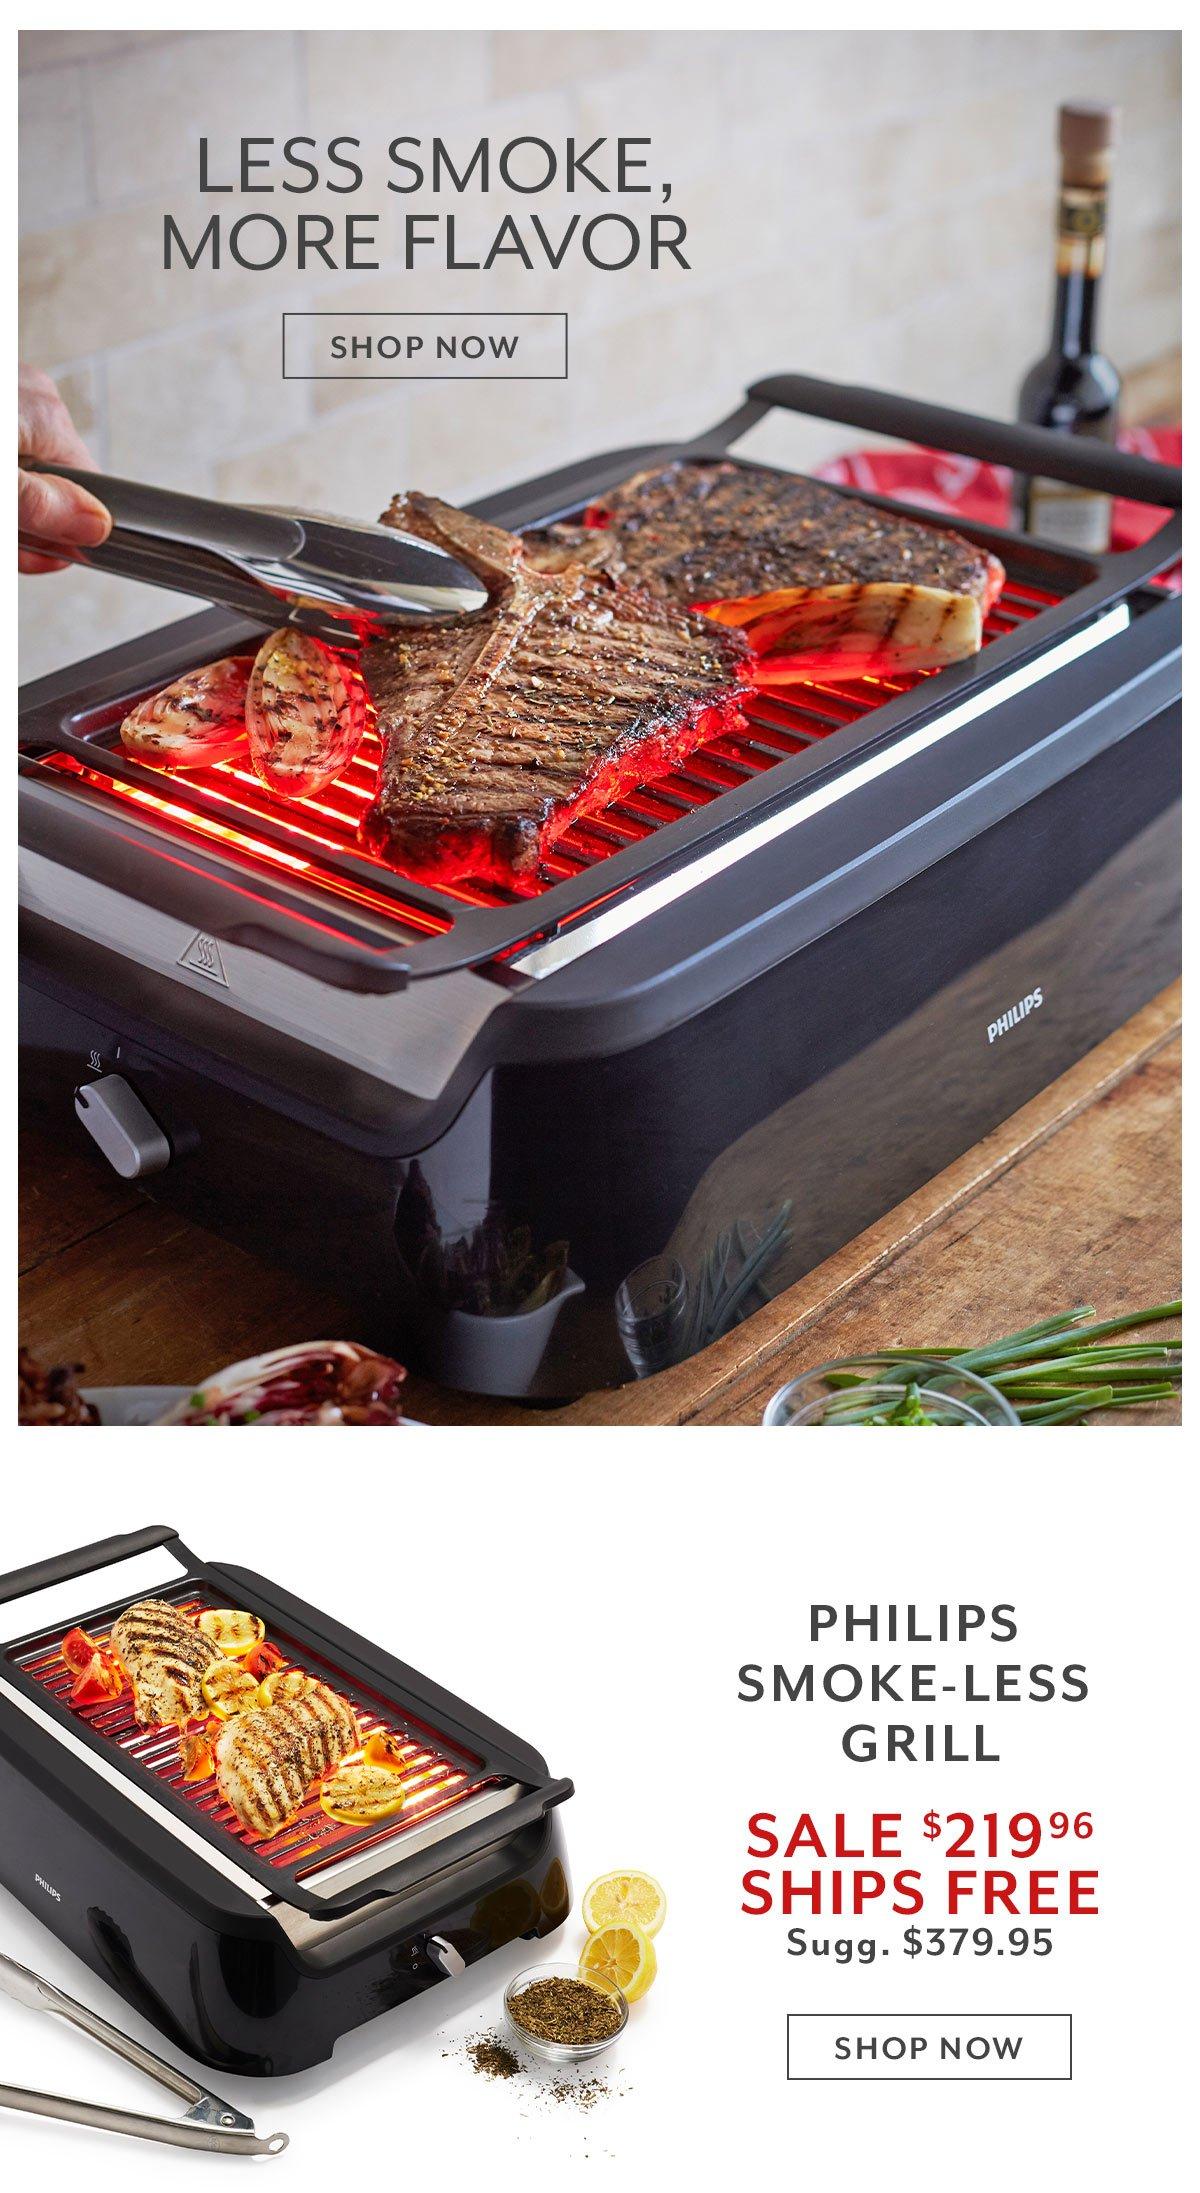 Phillips Smoke-less Grill